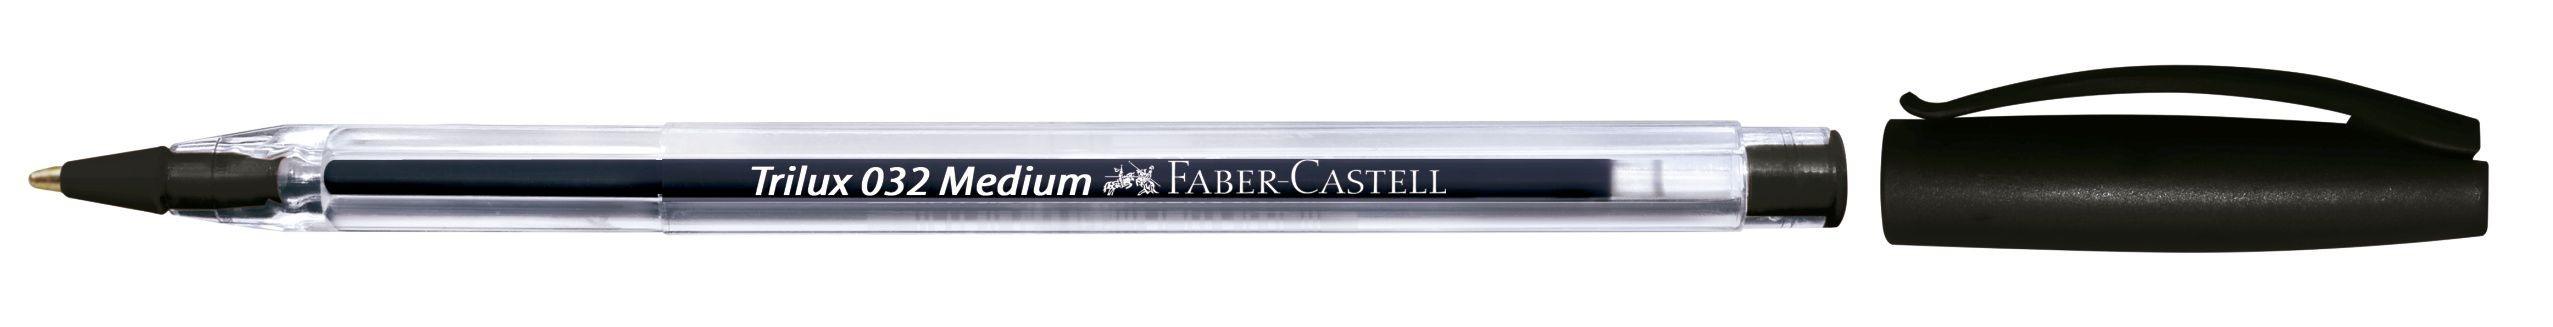 PIX UNICA FOLOSINTA NEGRU TRILUX 032M FABER-CASTELL